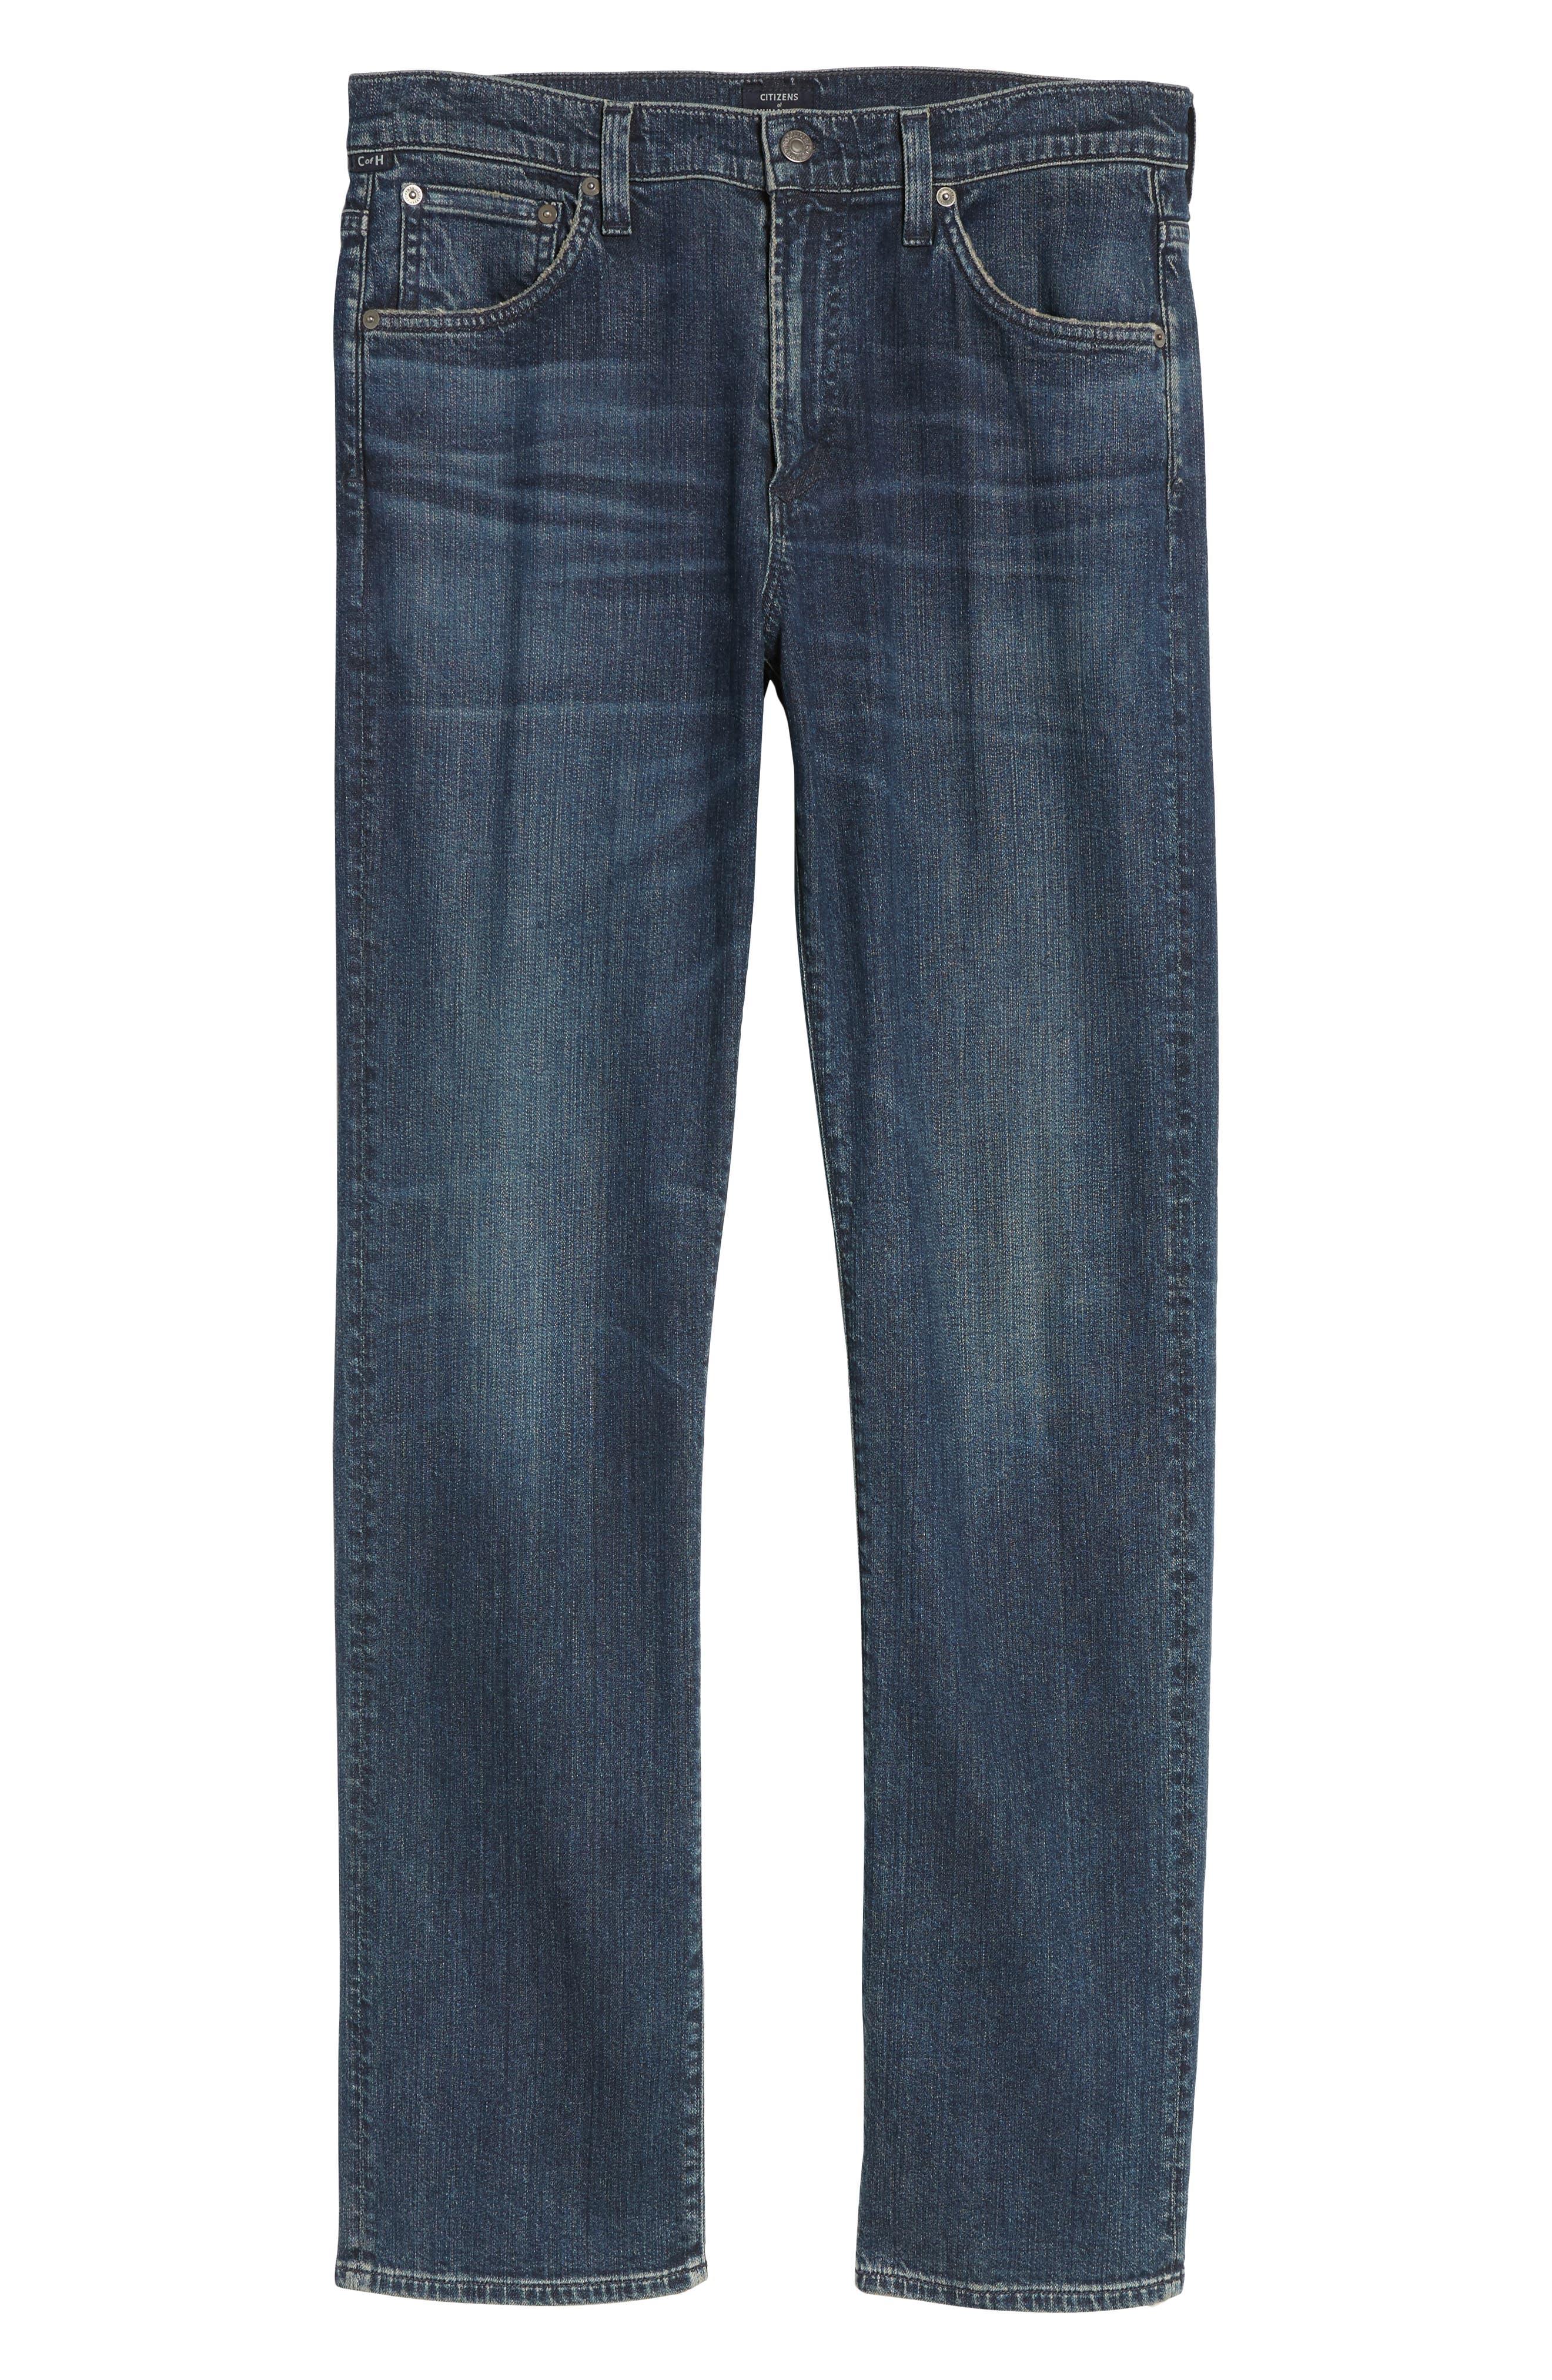 Sid Straight Leg Jeans,                             Alternate thumbnail 6, color,                             BLAZE